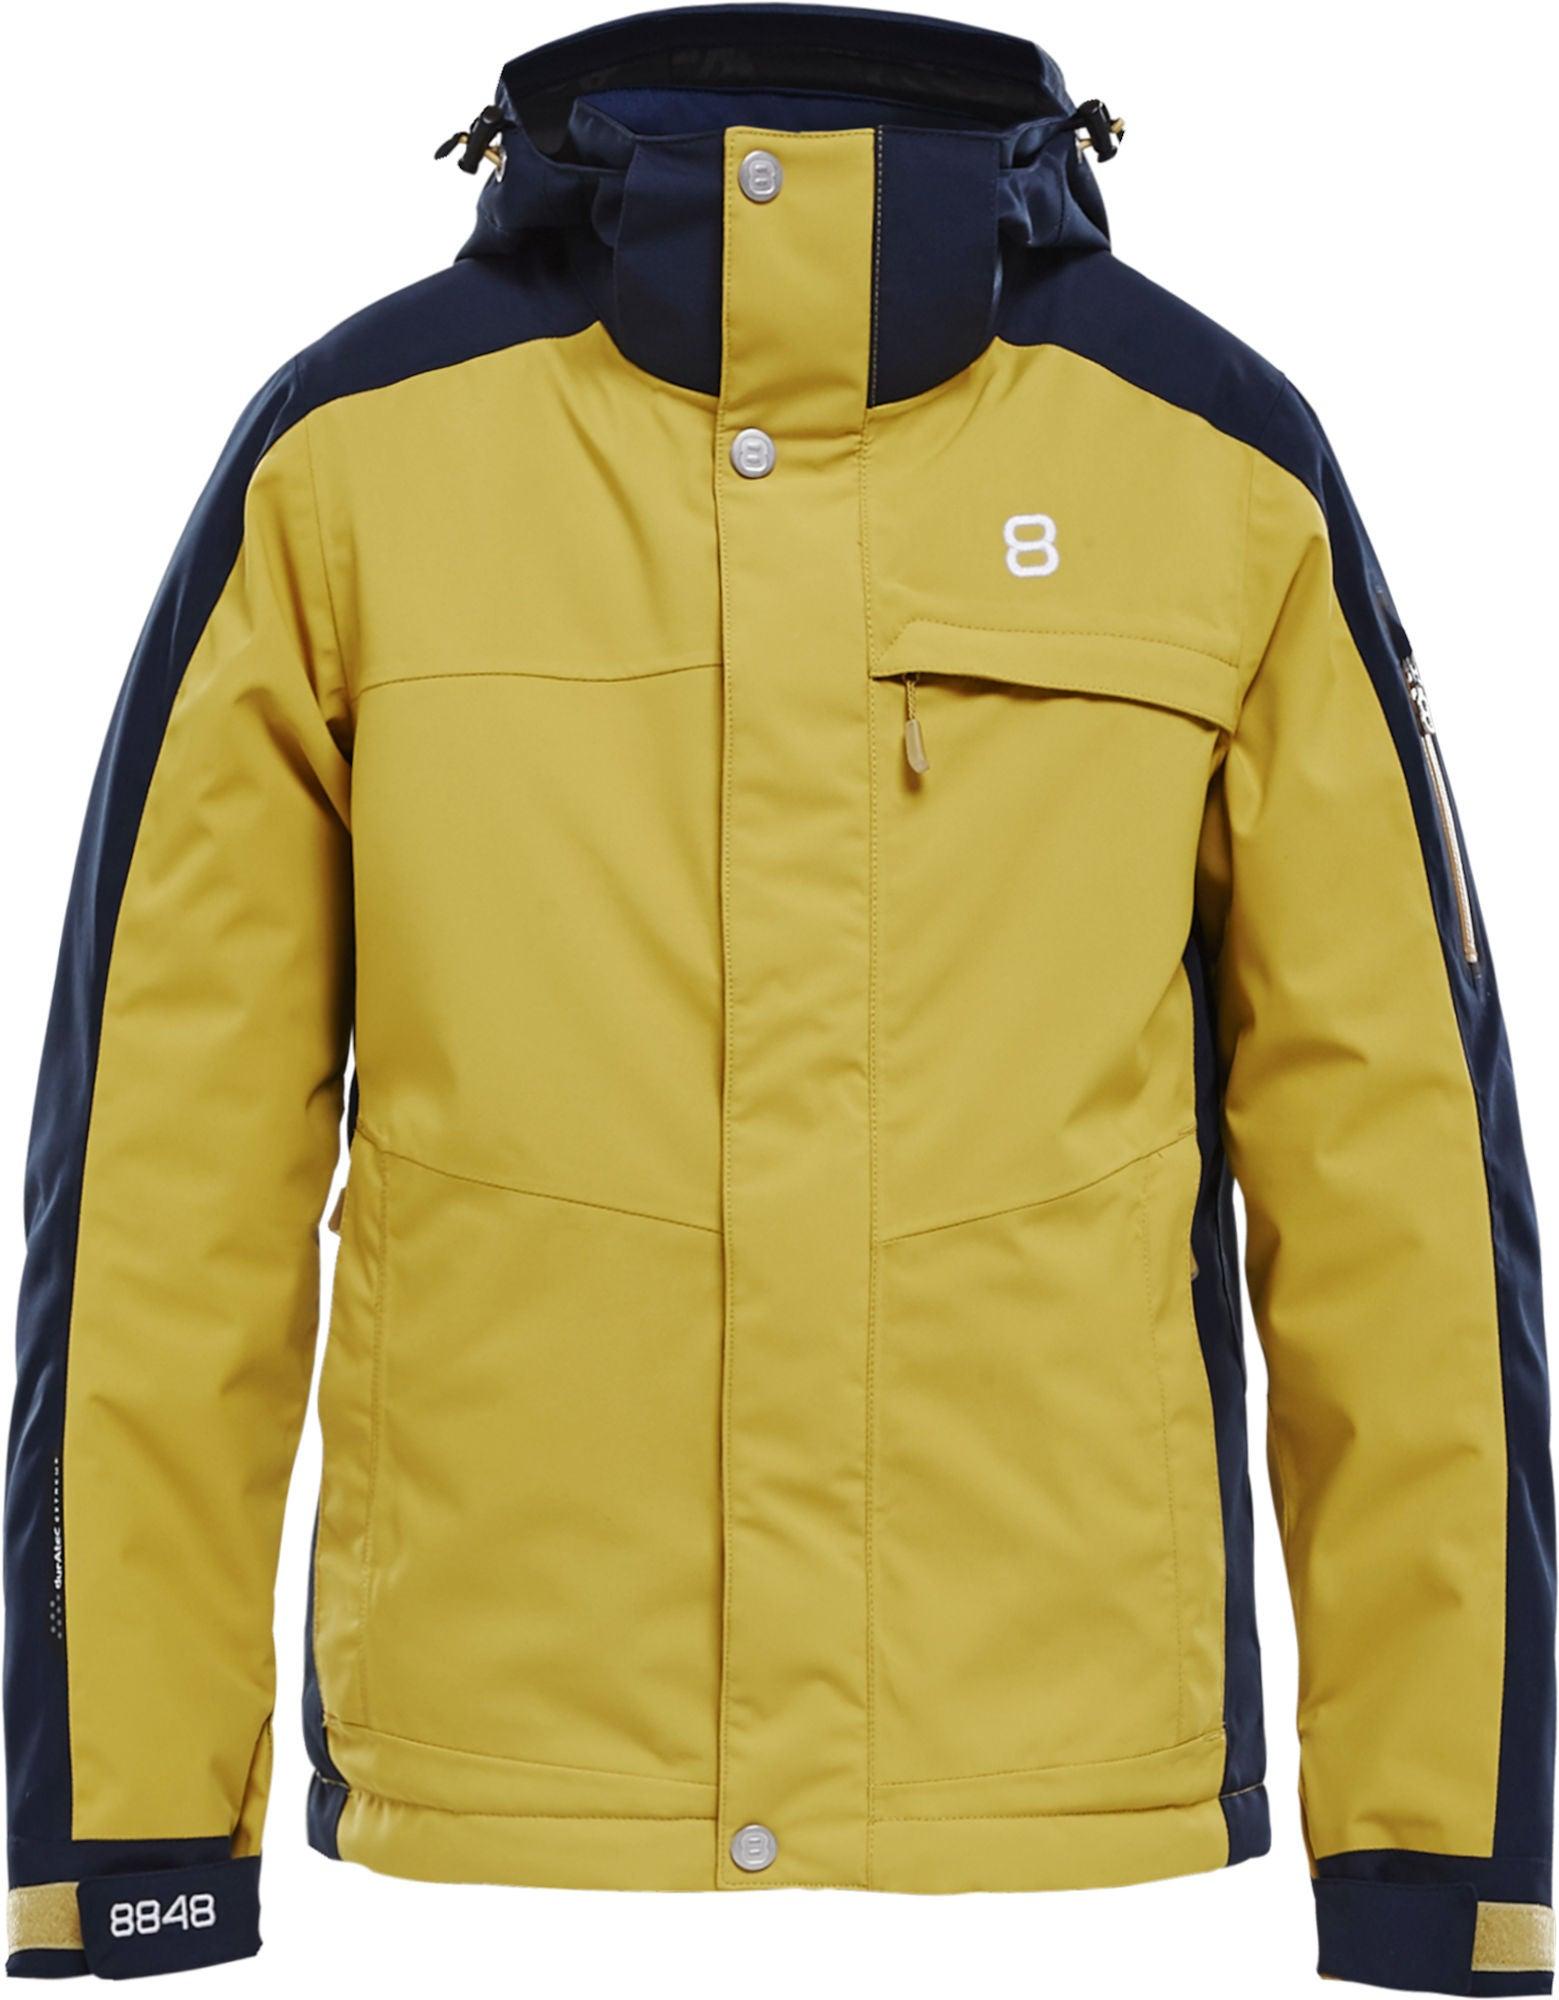 8848 Altitude Gils Jr Jacka, Mustard 120